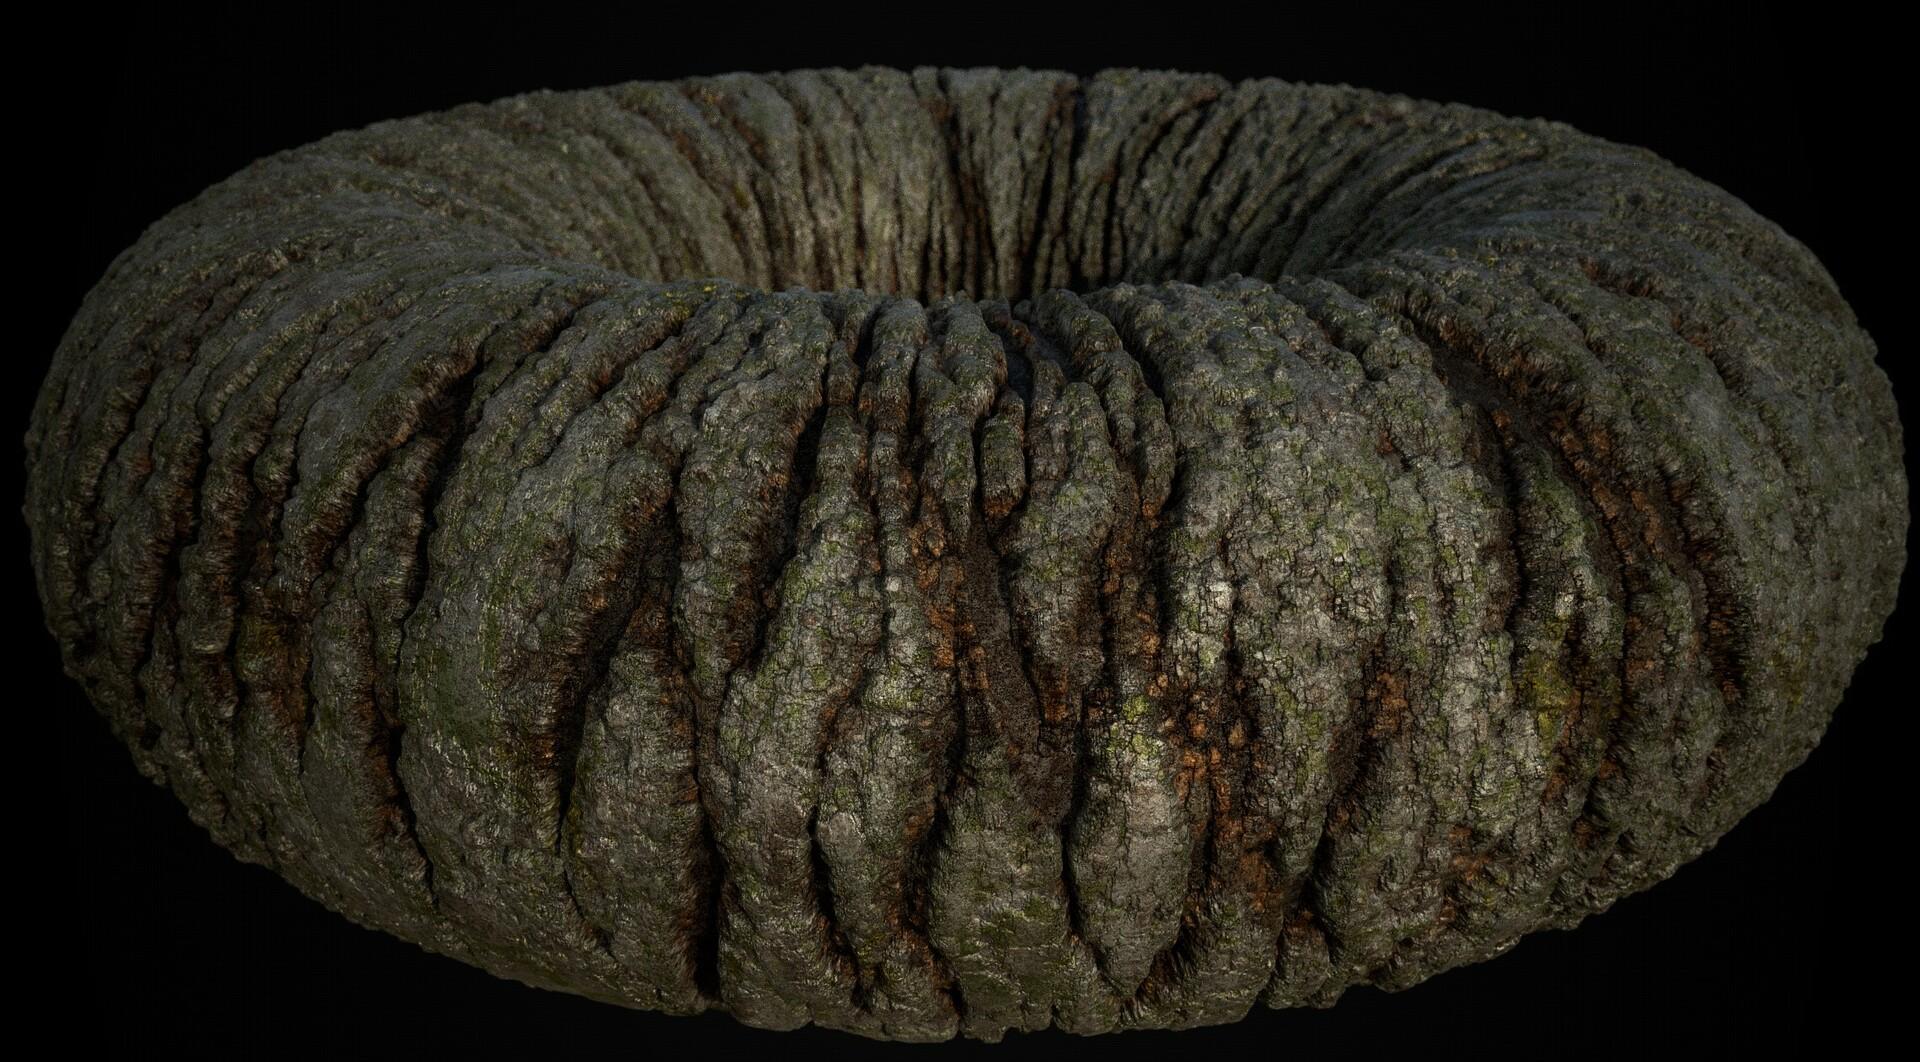 Marcelo souza bark 01 01 torus